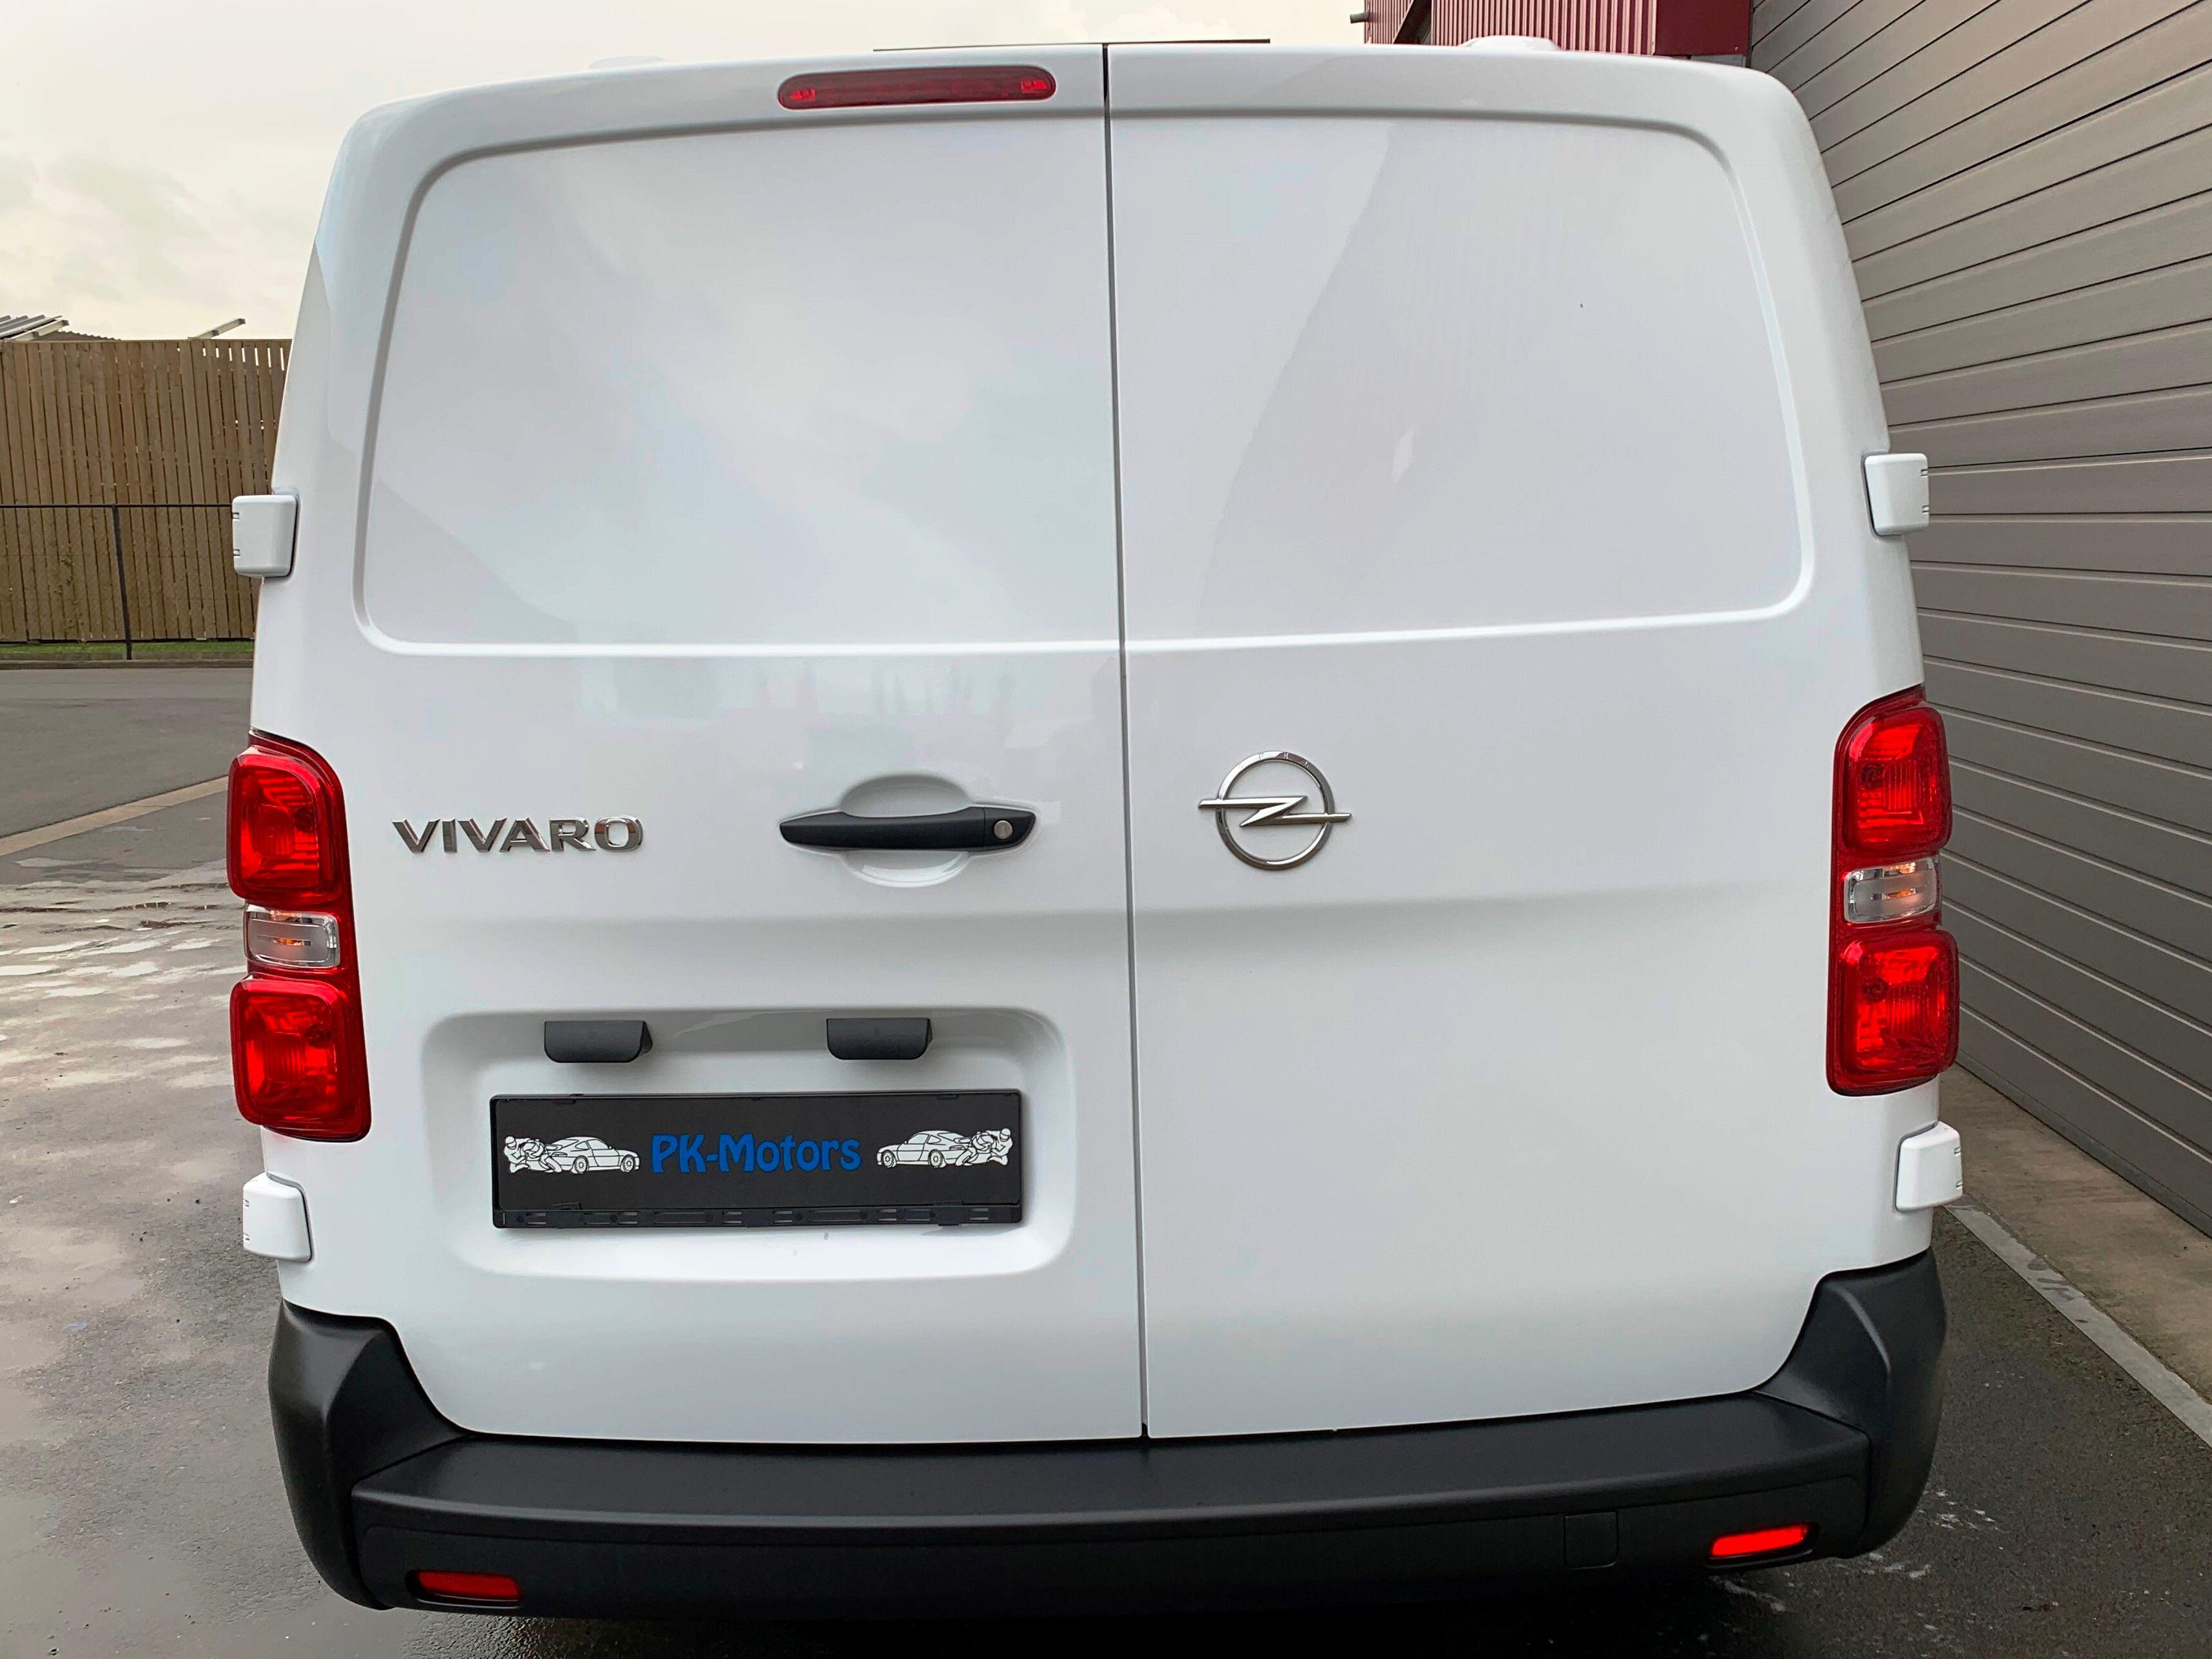 Opel Vivaro 2.0D 122PK Edition L3H1 NIEUW in stock 35% korting 6/29